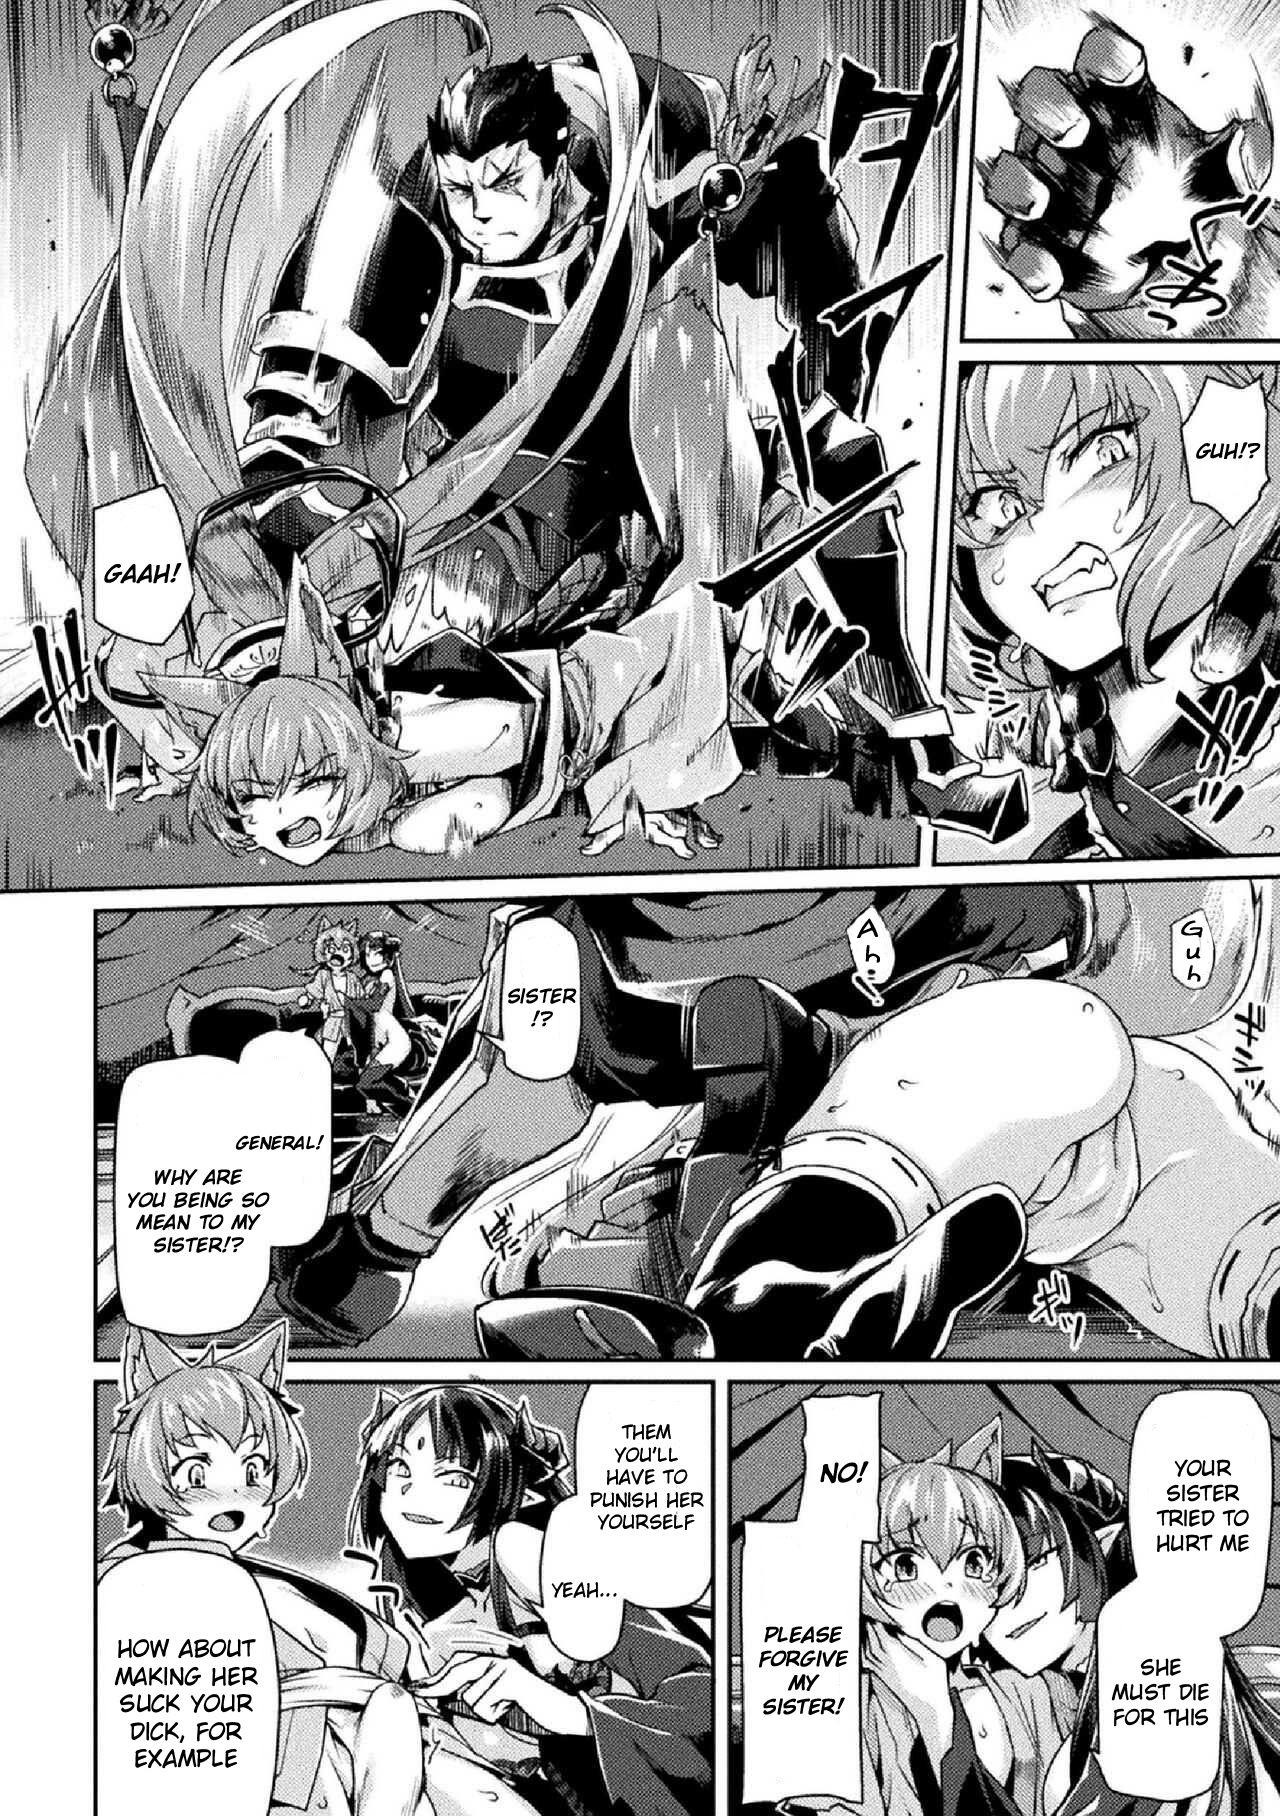 [Tsukitokage] Kuroinu II ~Inyoku ni Somaru Haitoku no Miyako, Futatabi~ THE COMIC Chapter 5 (Kukkoro Heroines Vol. 5) [Digital] [English] [Decensored] (Klub Kemoner) 3